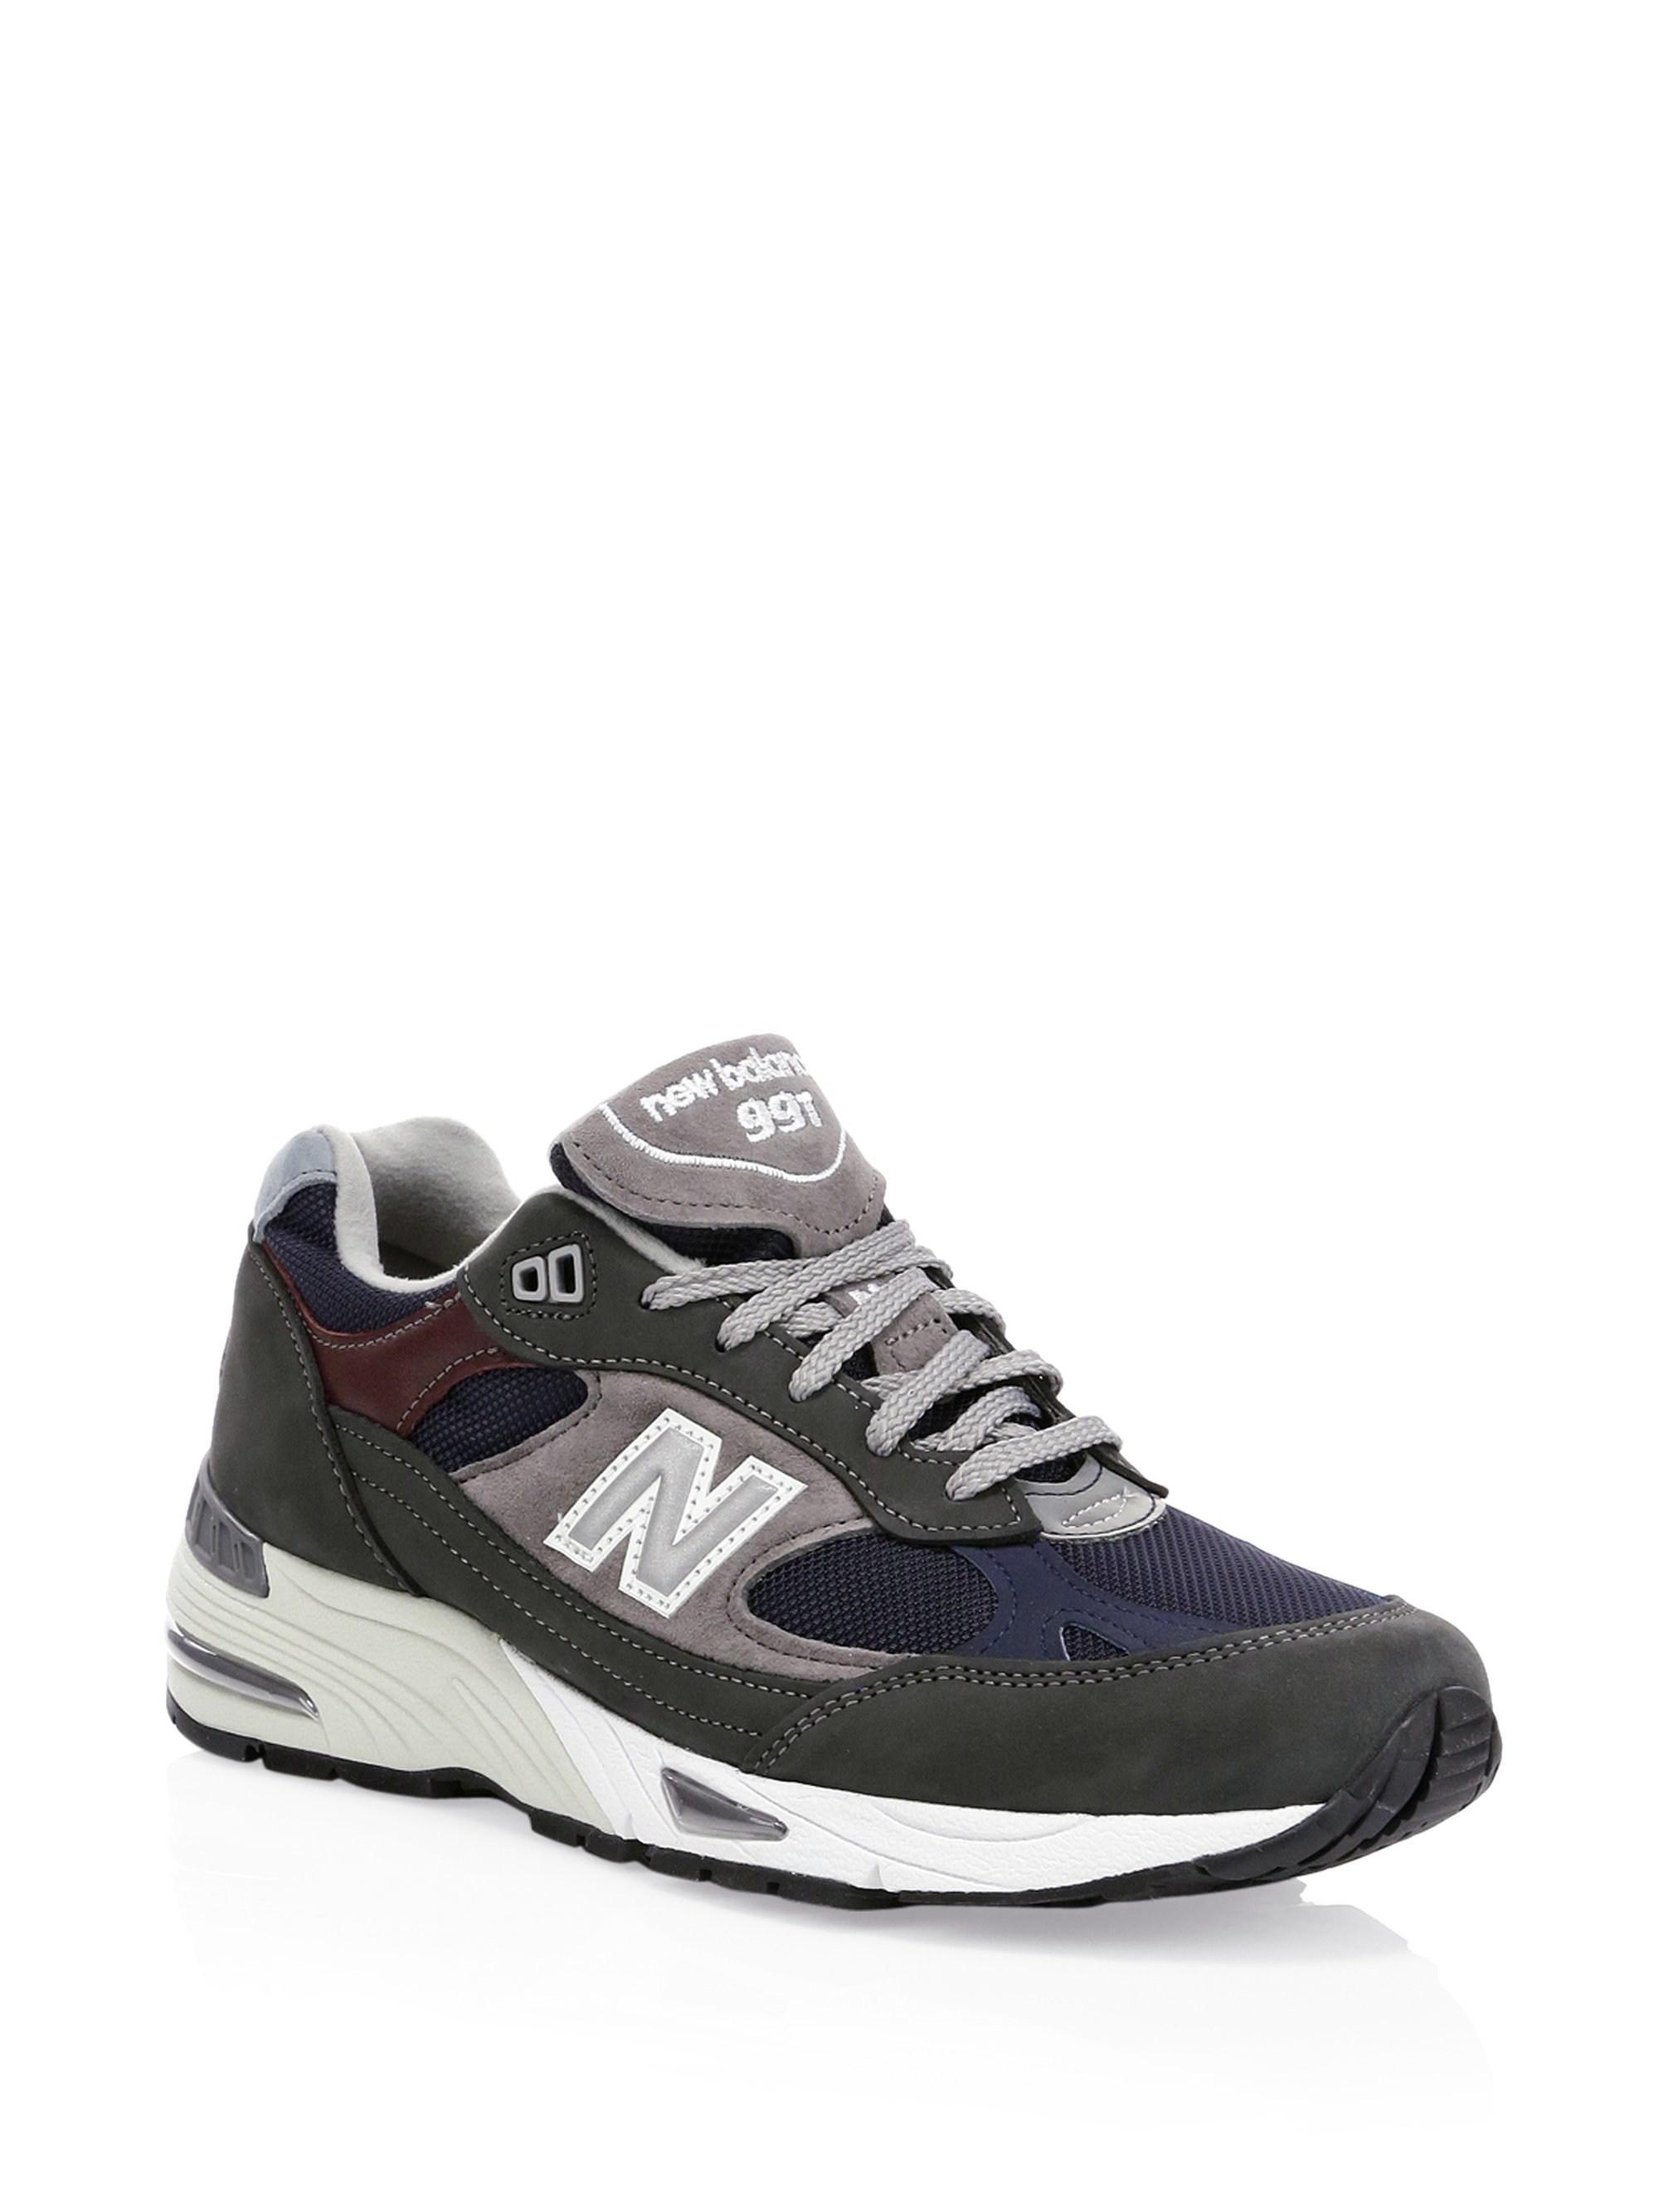 new balance 991 suede